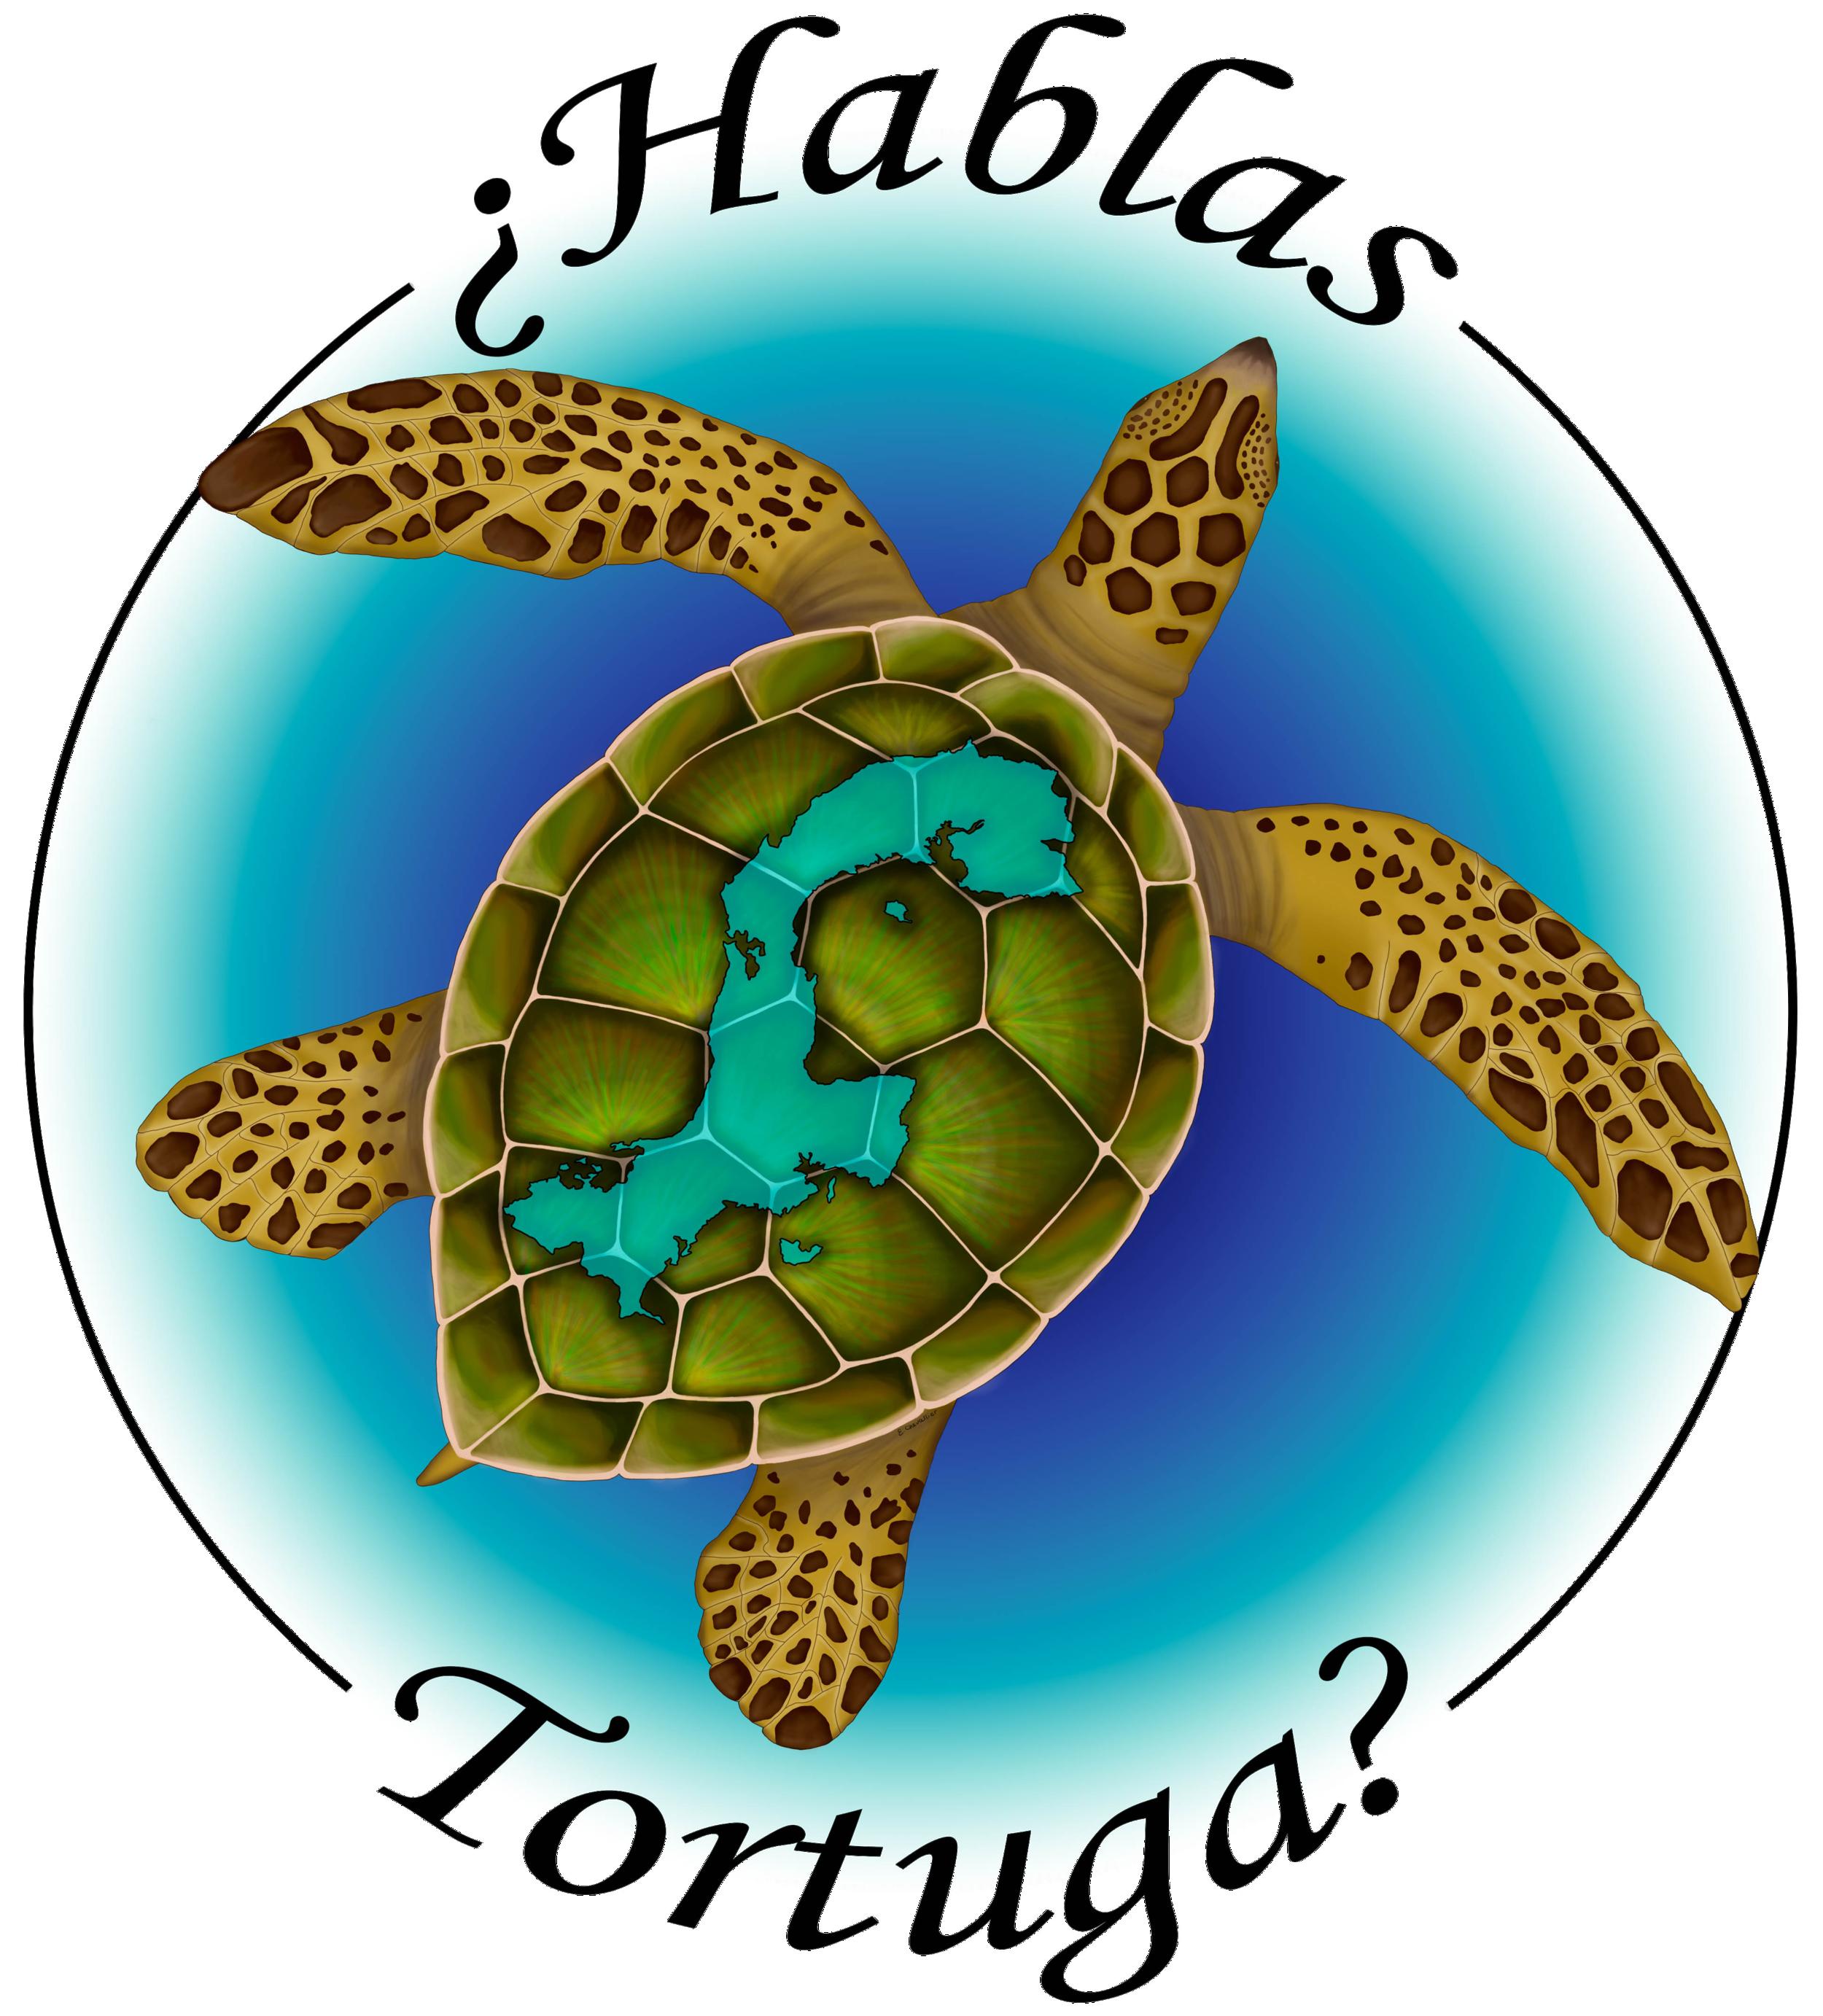 Hablas Tortuga